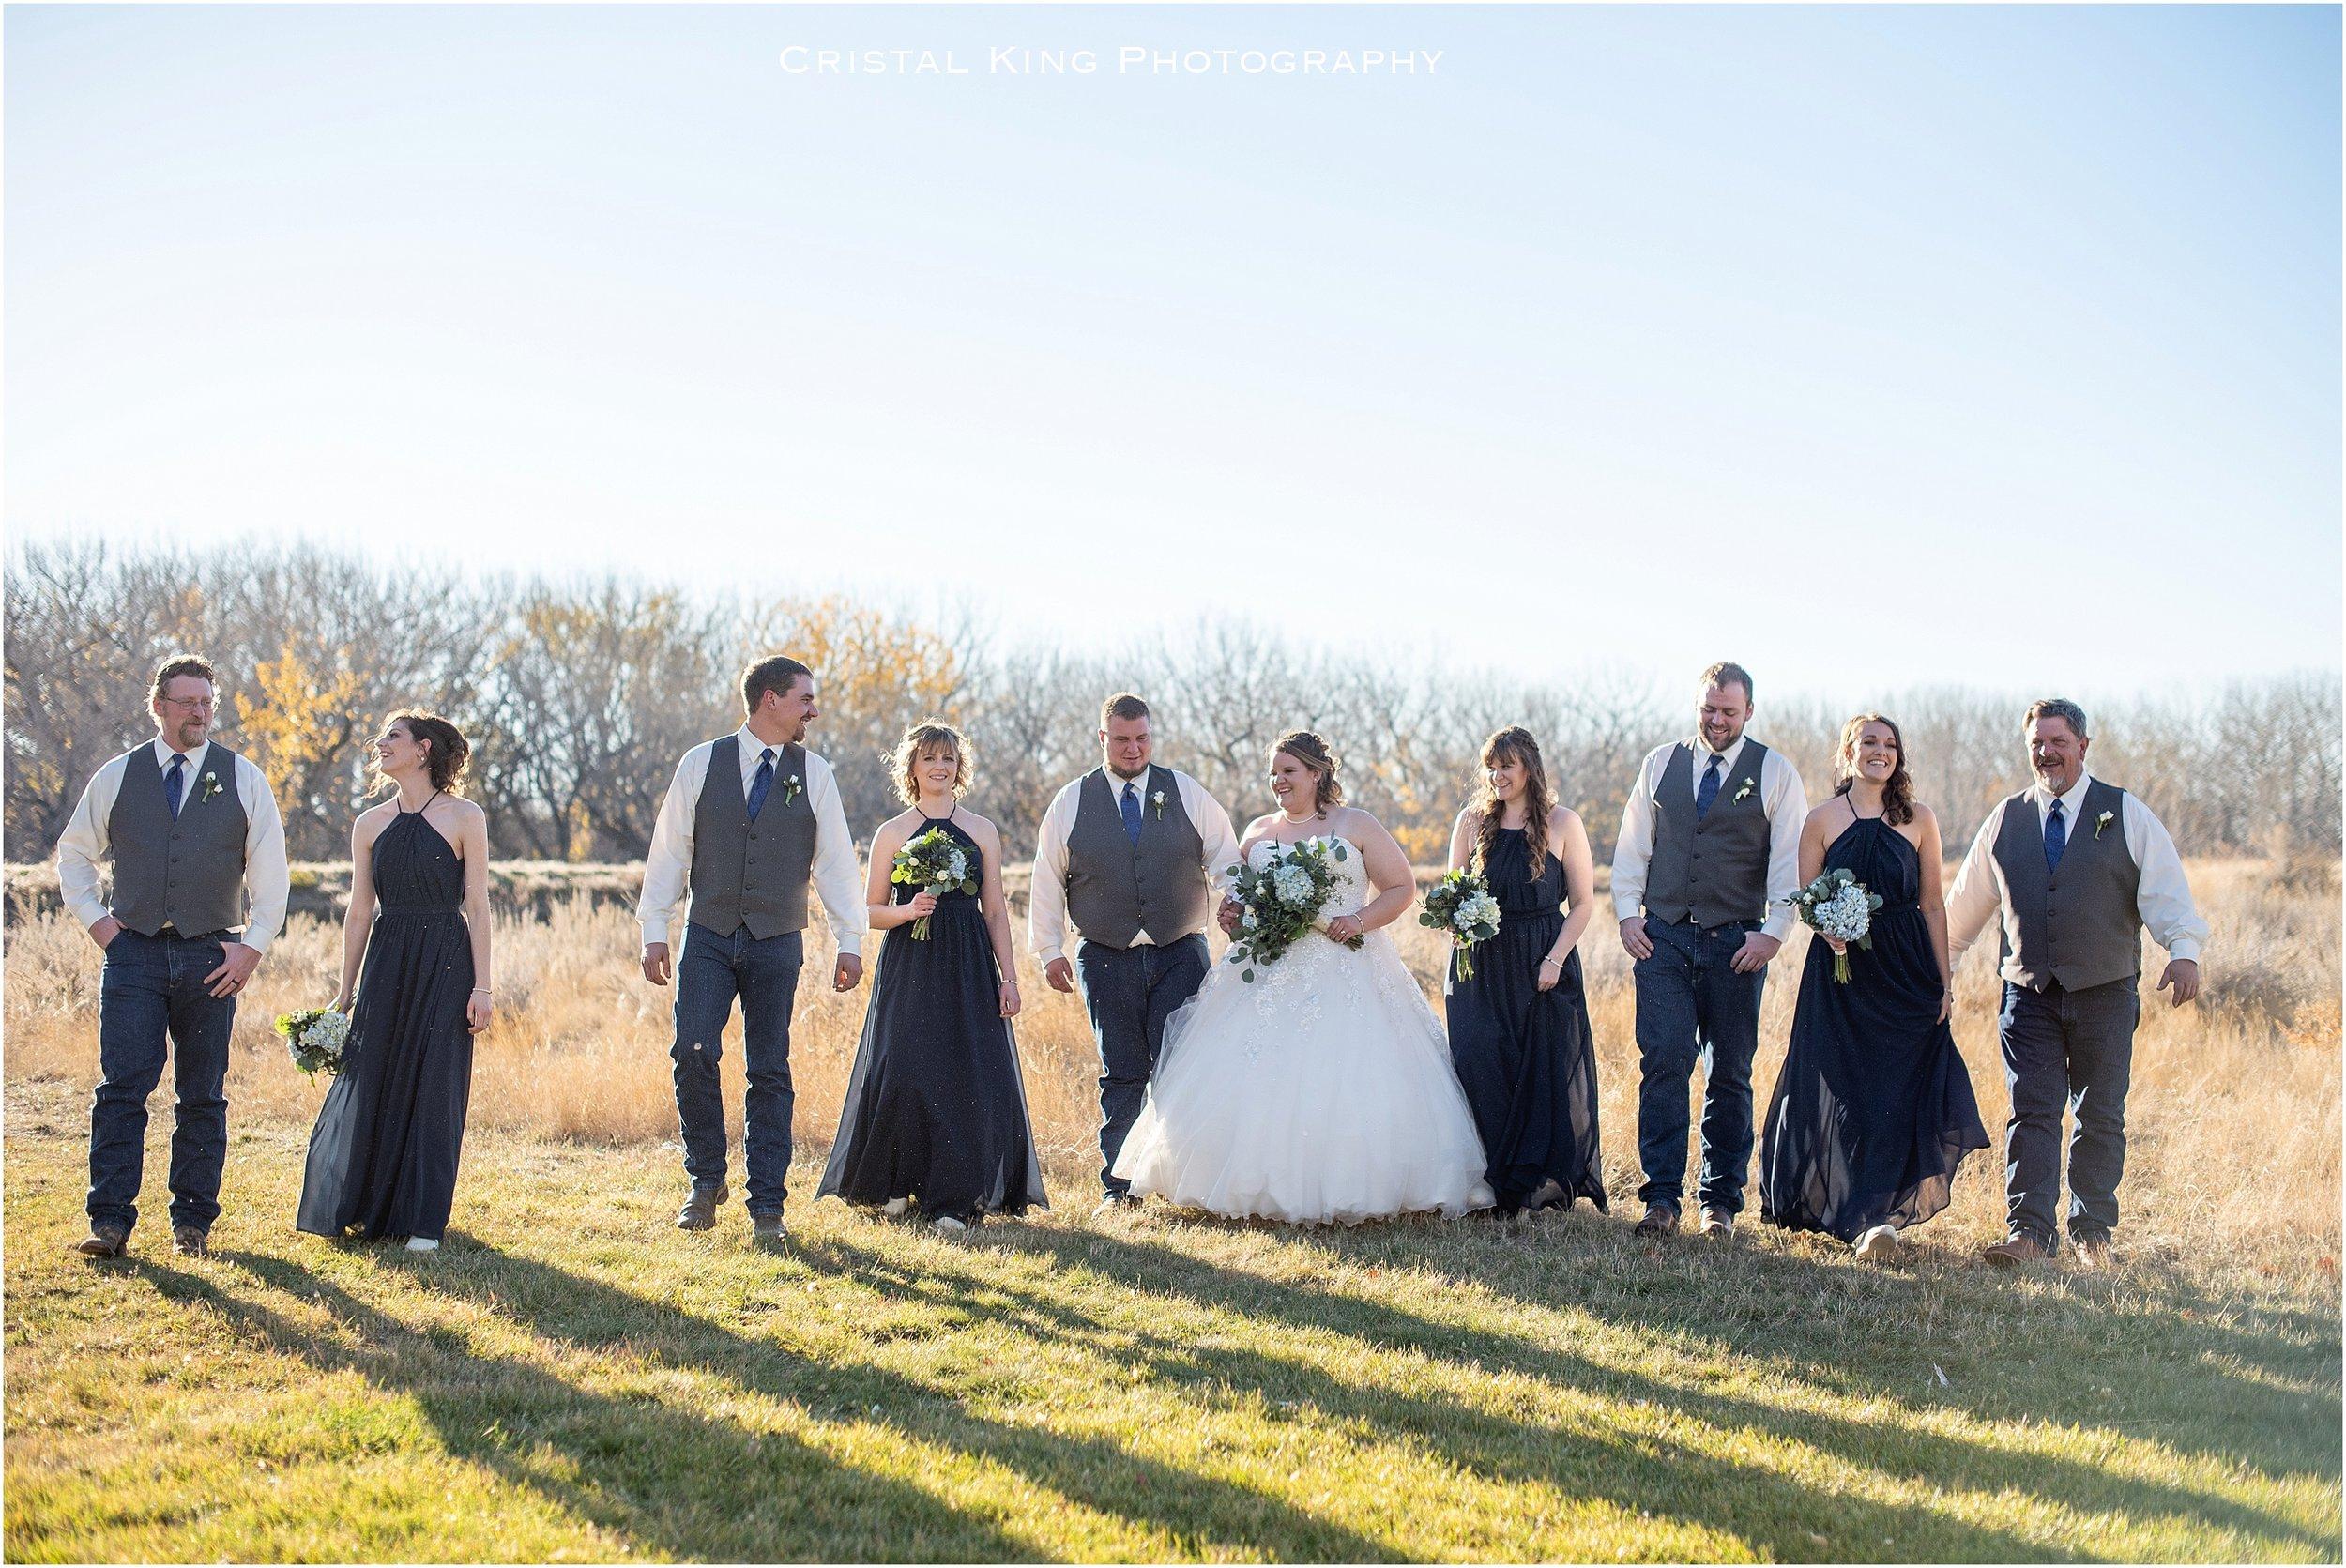 Tracy-Kyles-Wedding-122.jpg